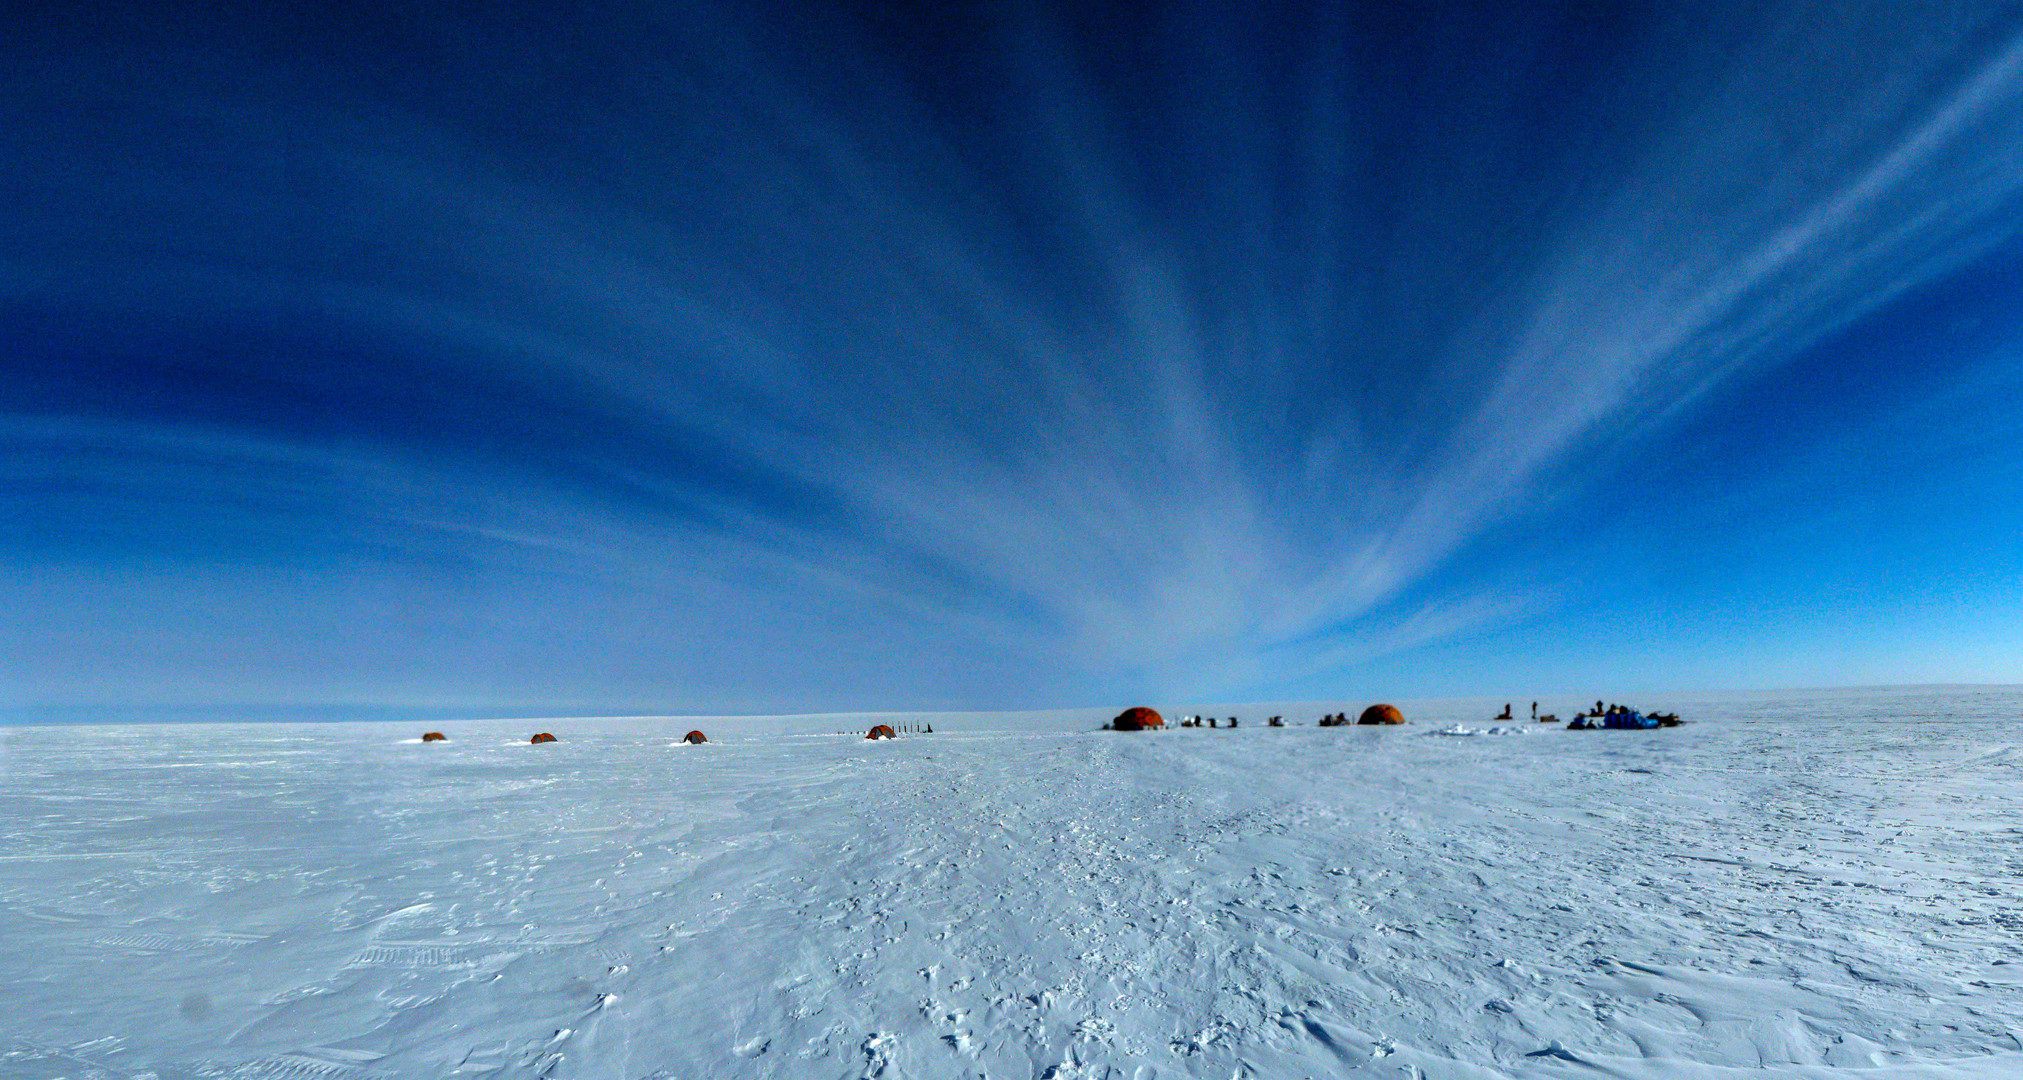 pano camp clouds.jpg